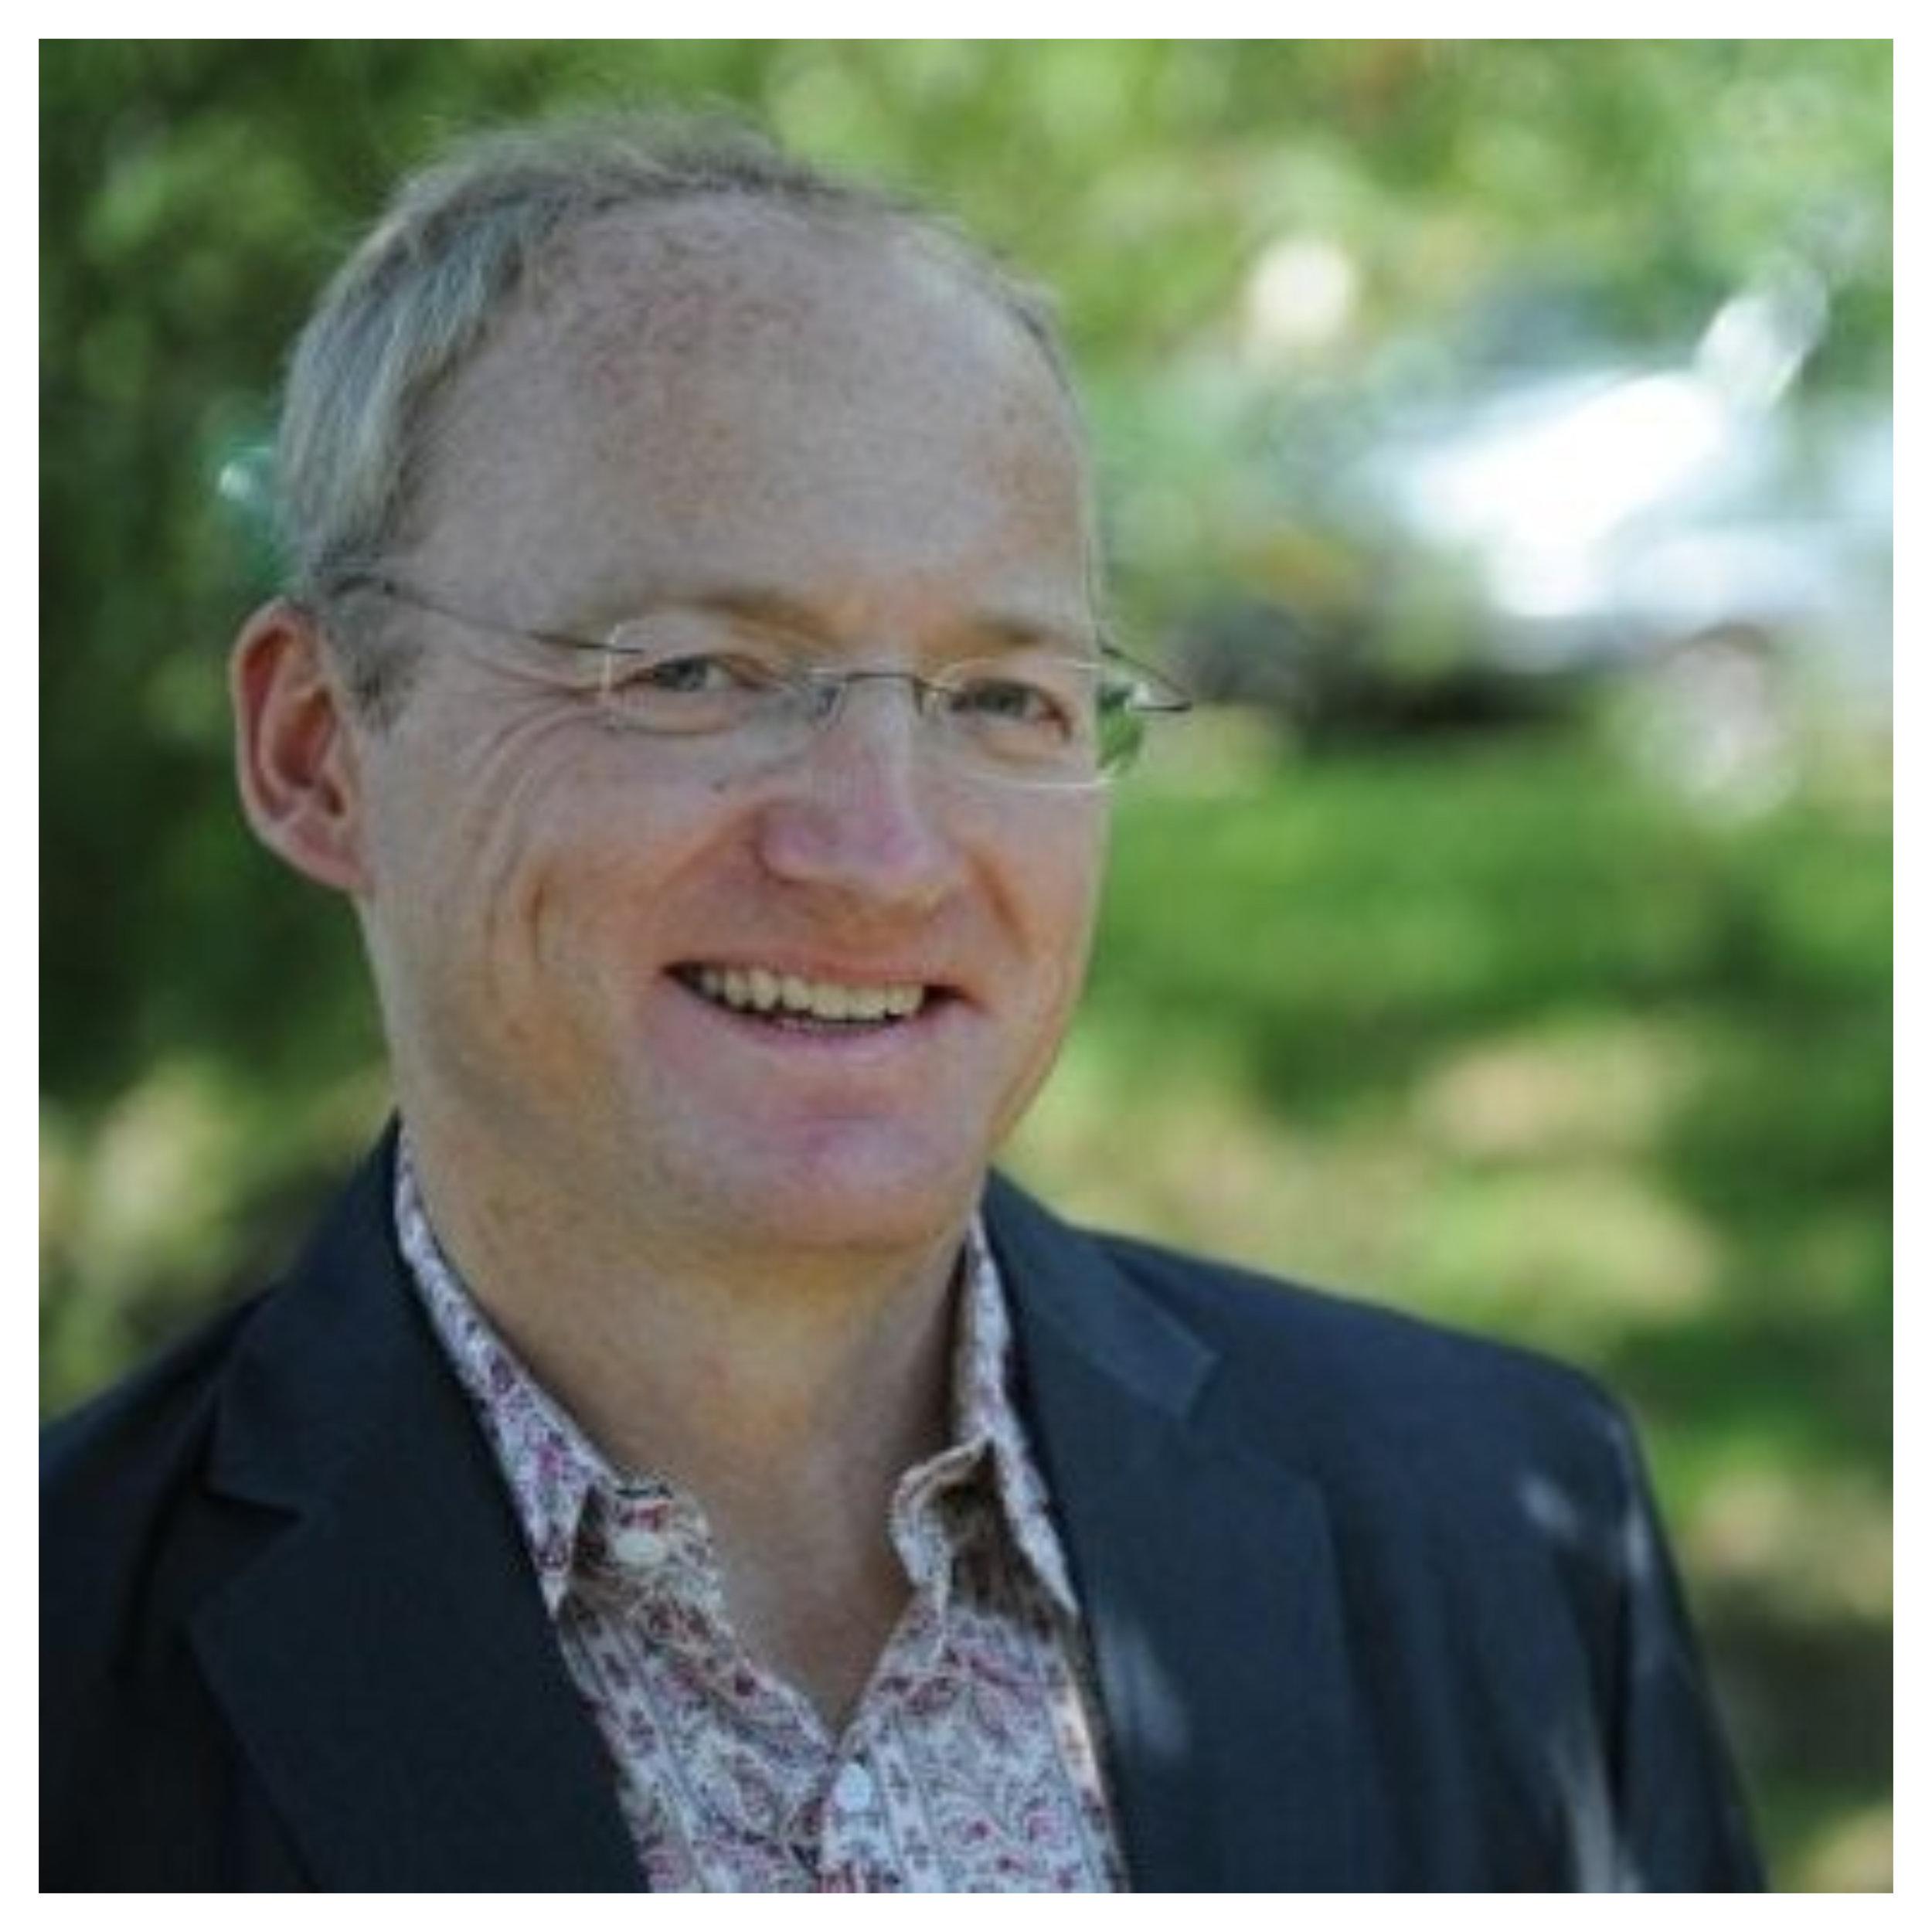 Toby Walsh, Professor of Artificial Intelligence, UNSW/CSIRO